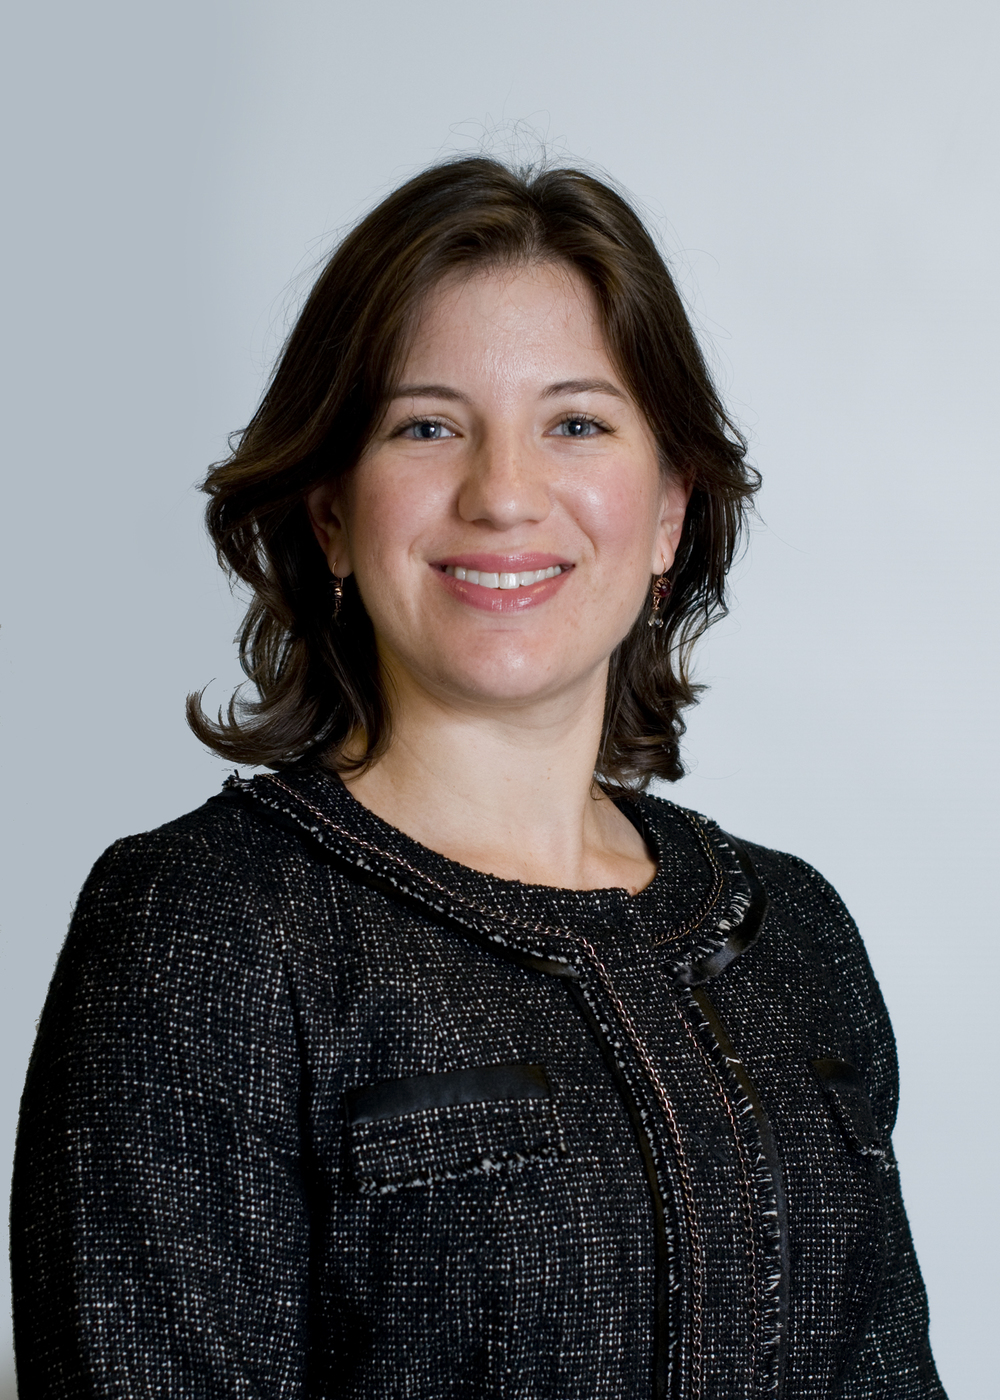 Julie Levison (Pennsylvania & Wadham 1998)